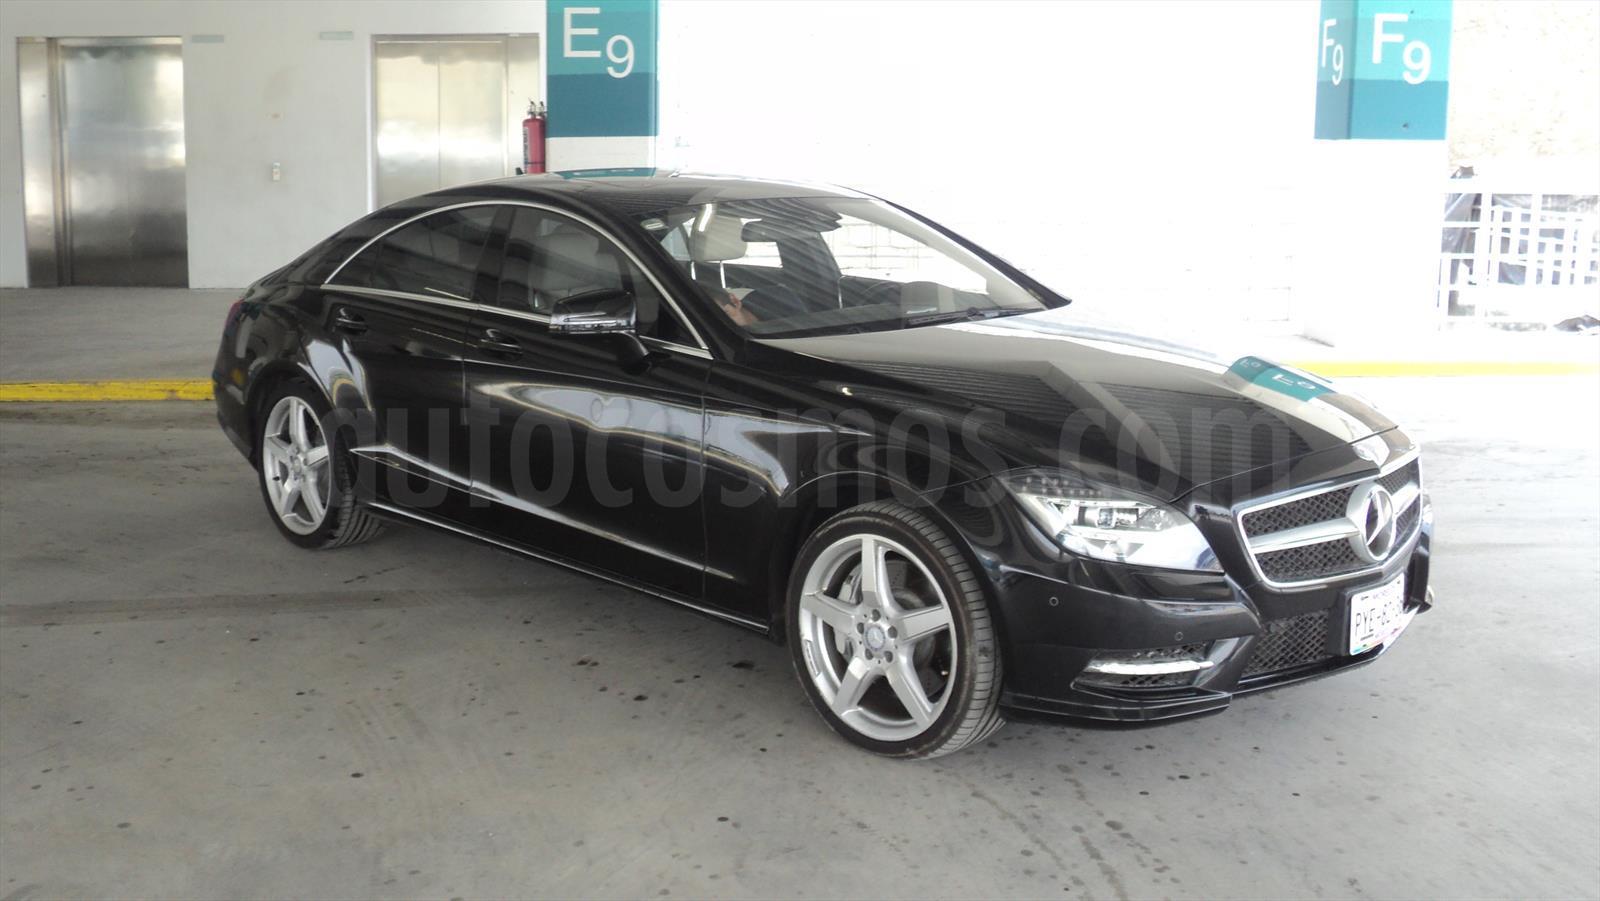 Venta auto usado mercedes benz clase cls 500 biturbo 2014 for Mercedes benz cls 500 precio